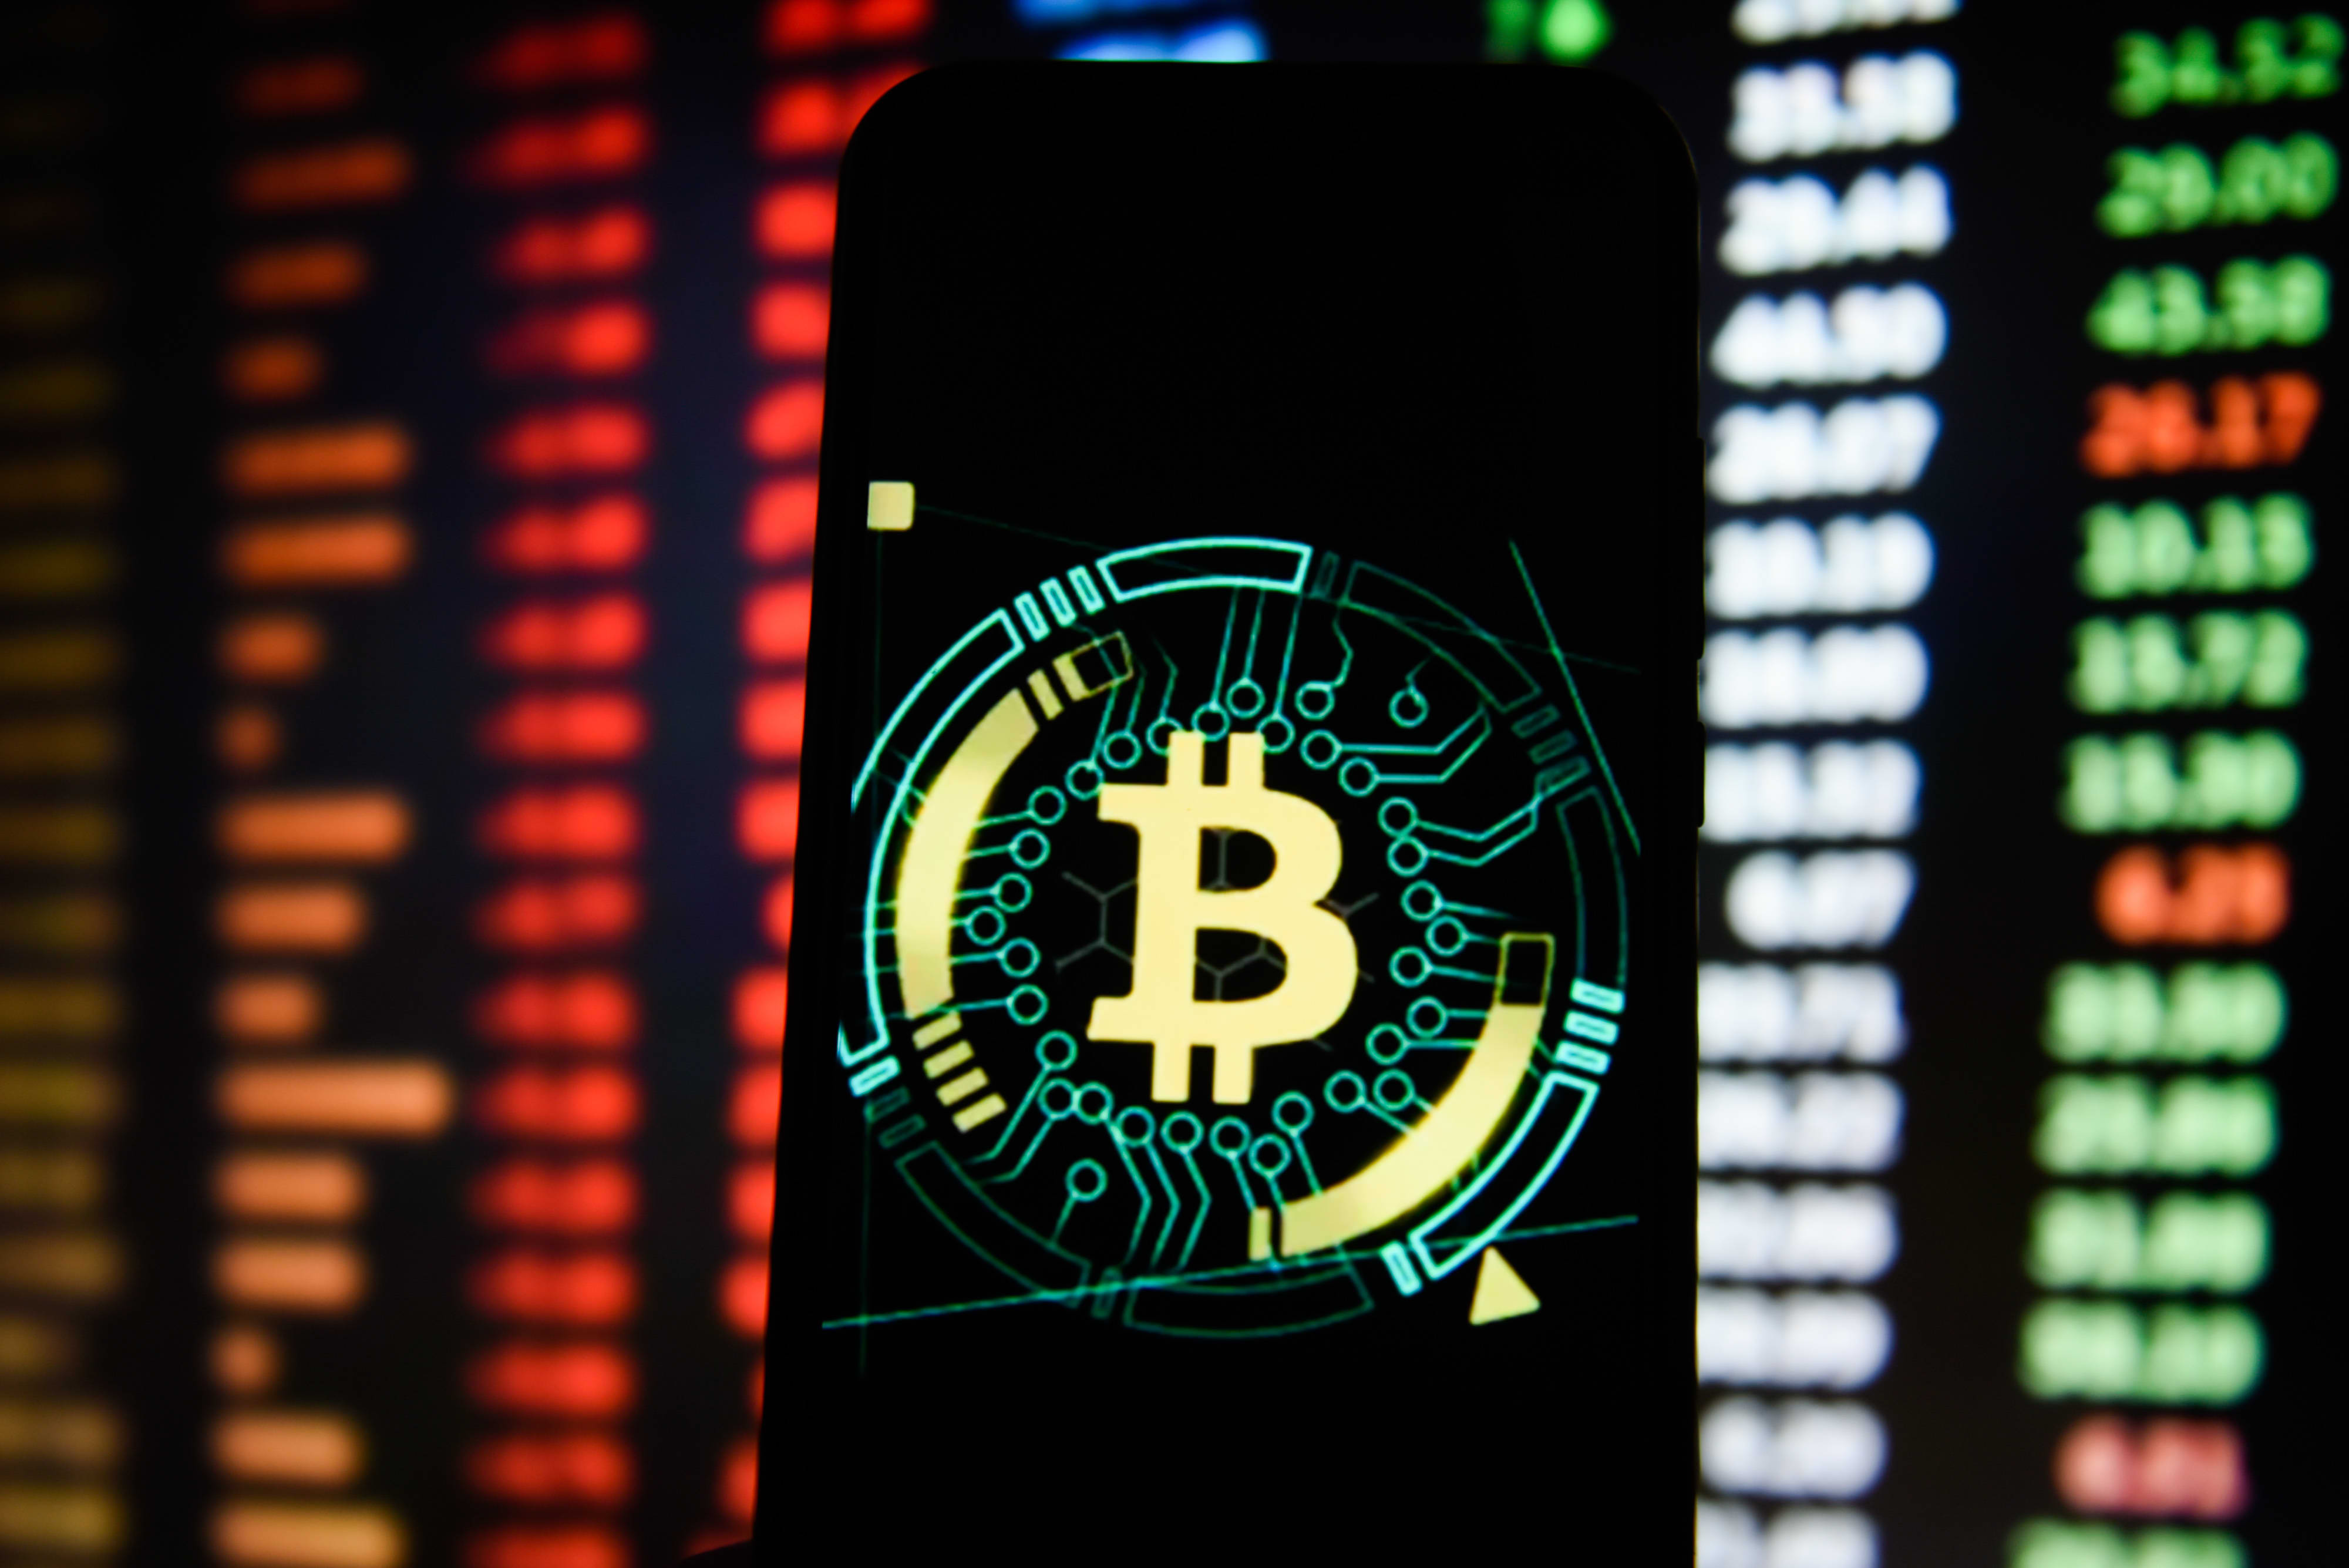 28 million bitcoins seized cars sports betting winnings calculator download